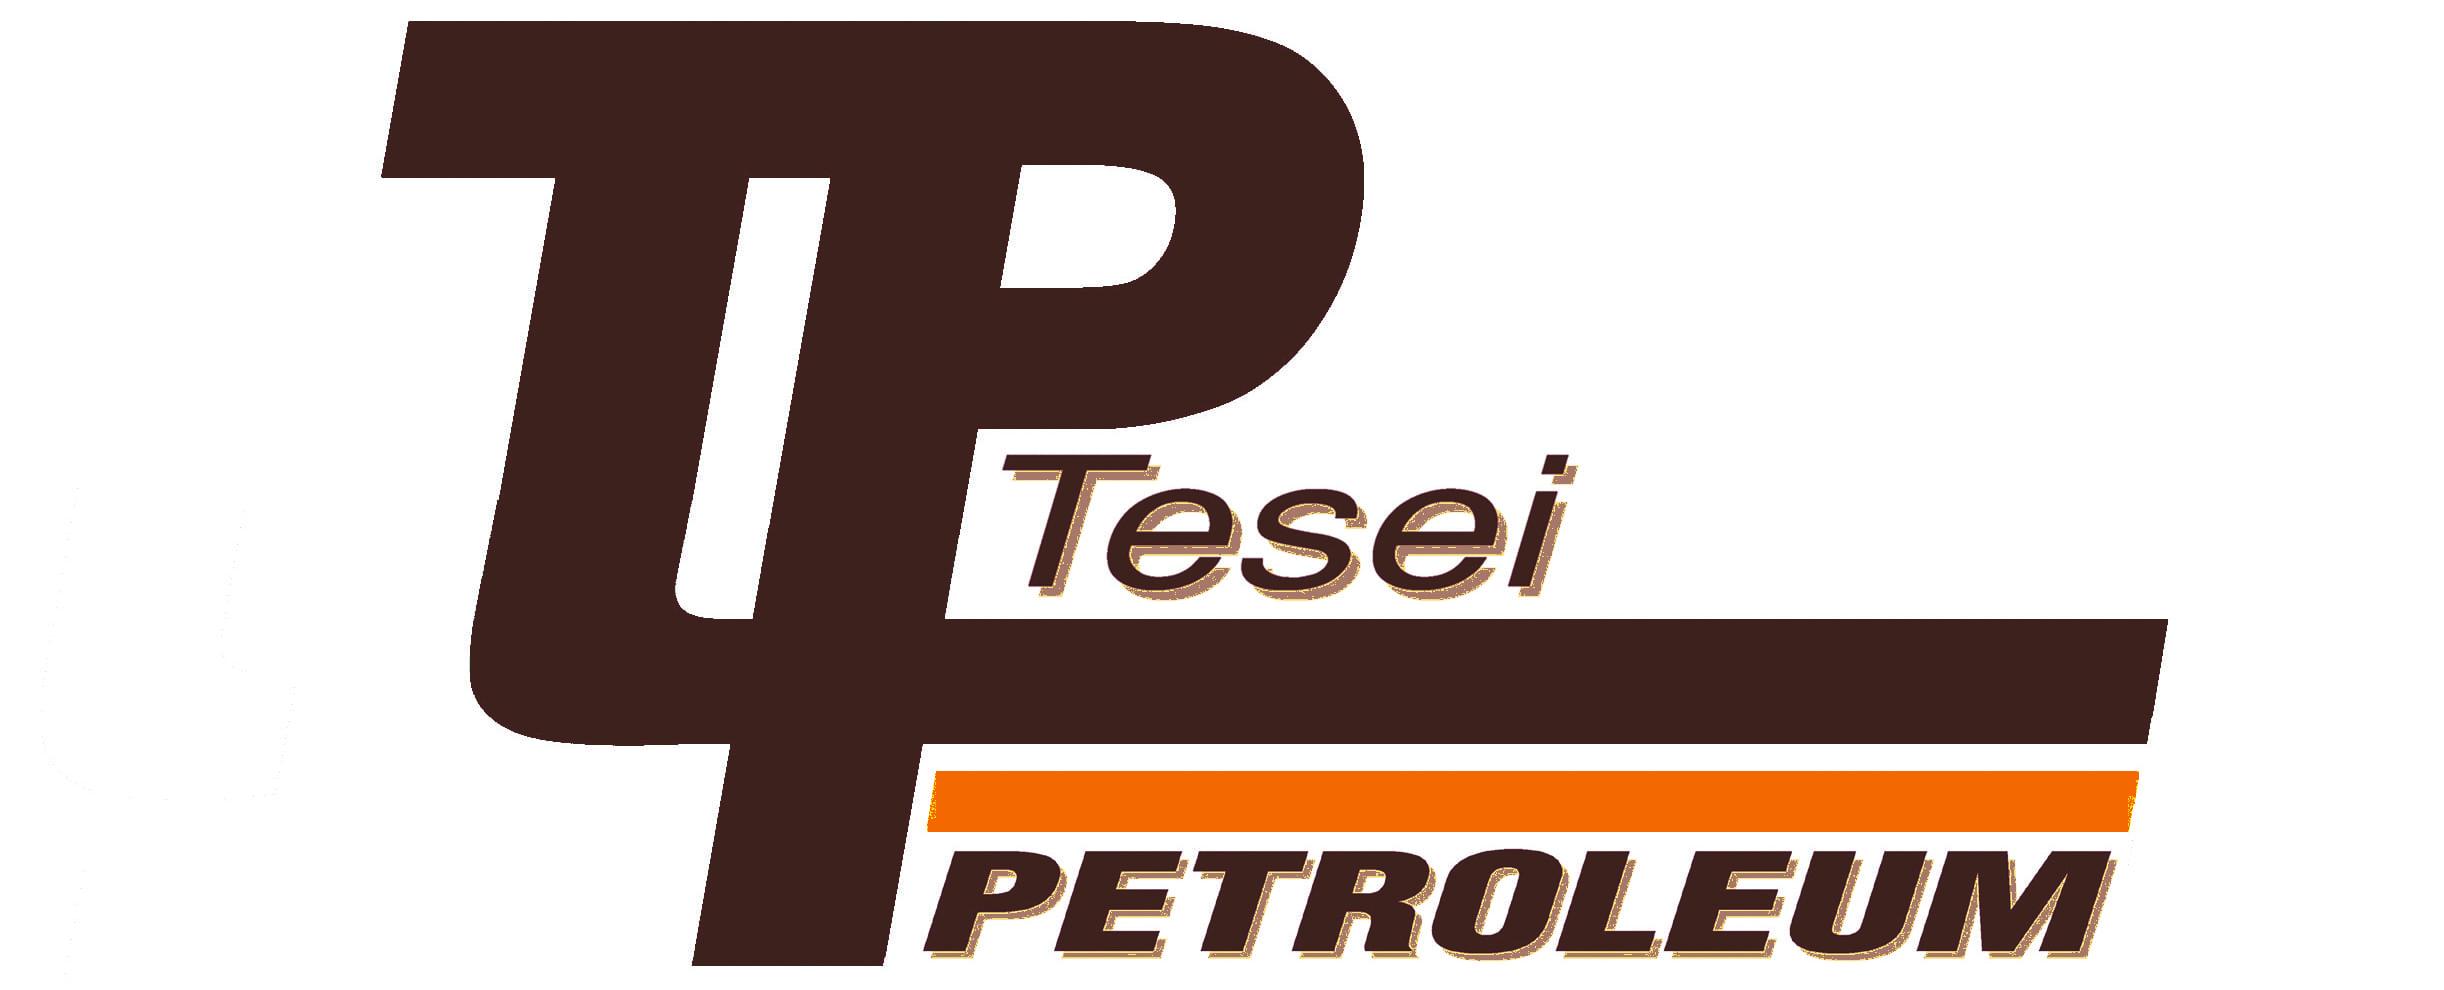 Tesei Petroleum